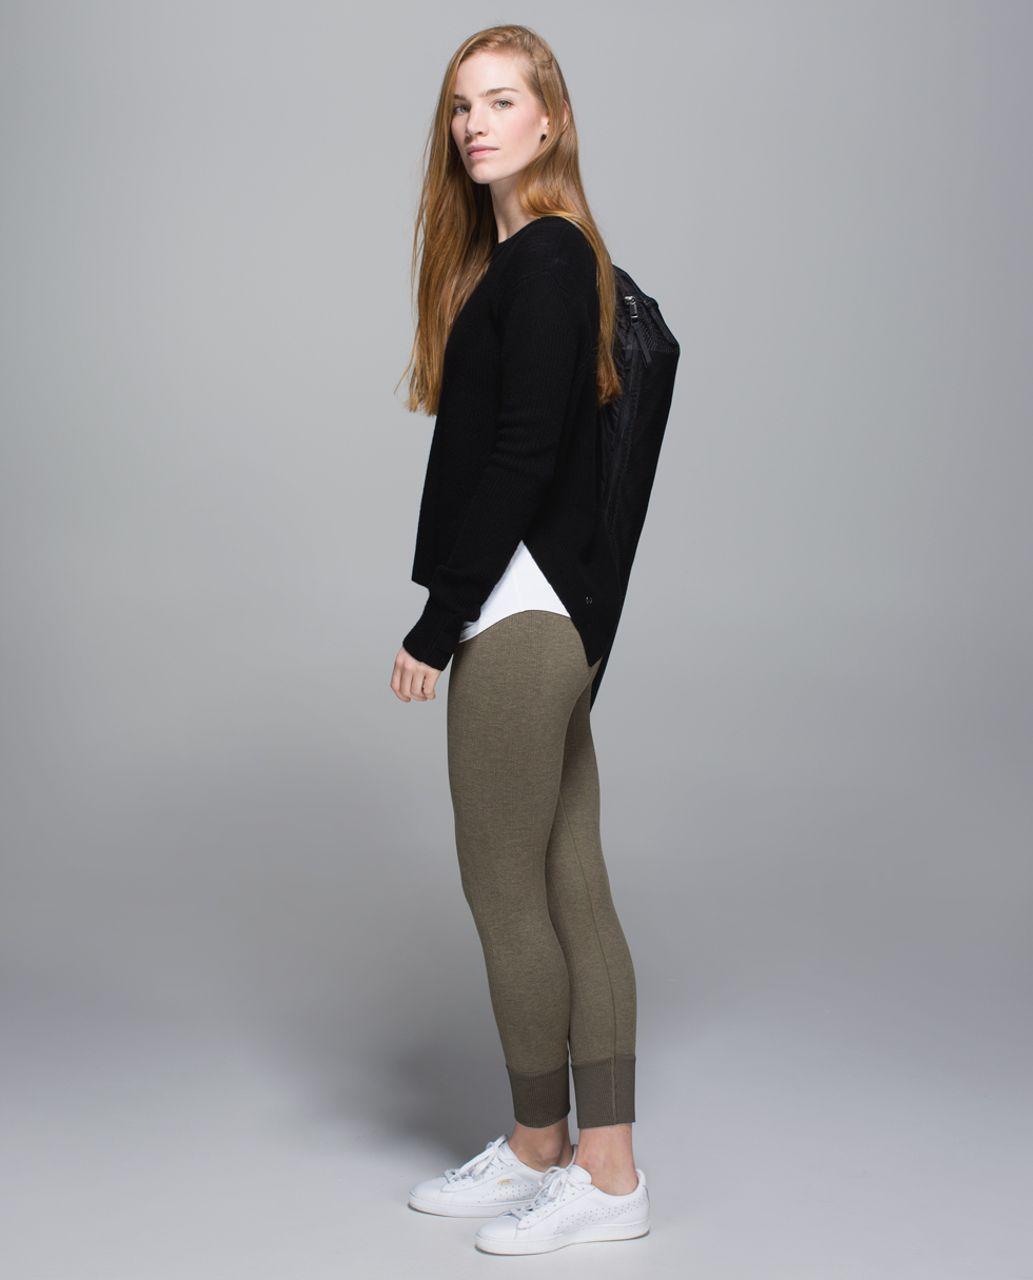 Lululemon Ebb To Street Pant - Heathered Fatigue Green